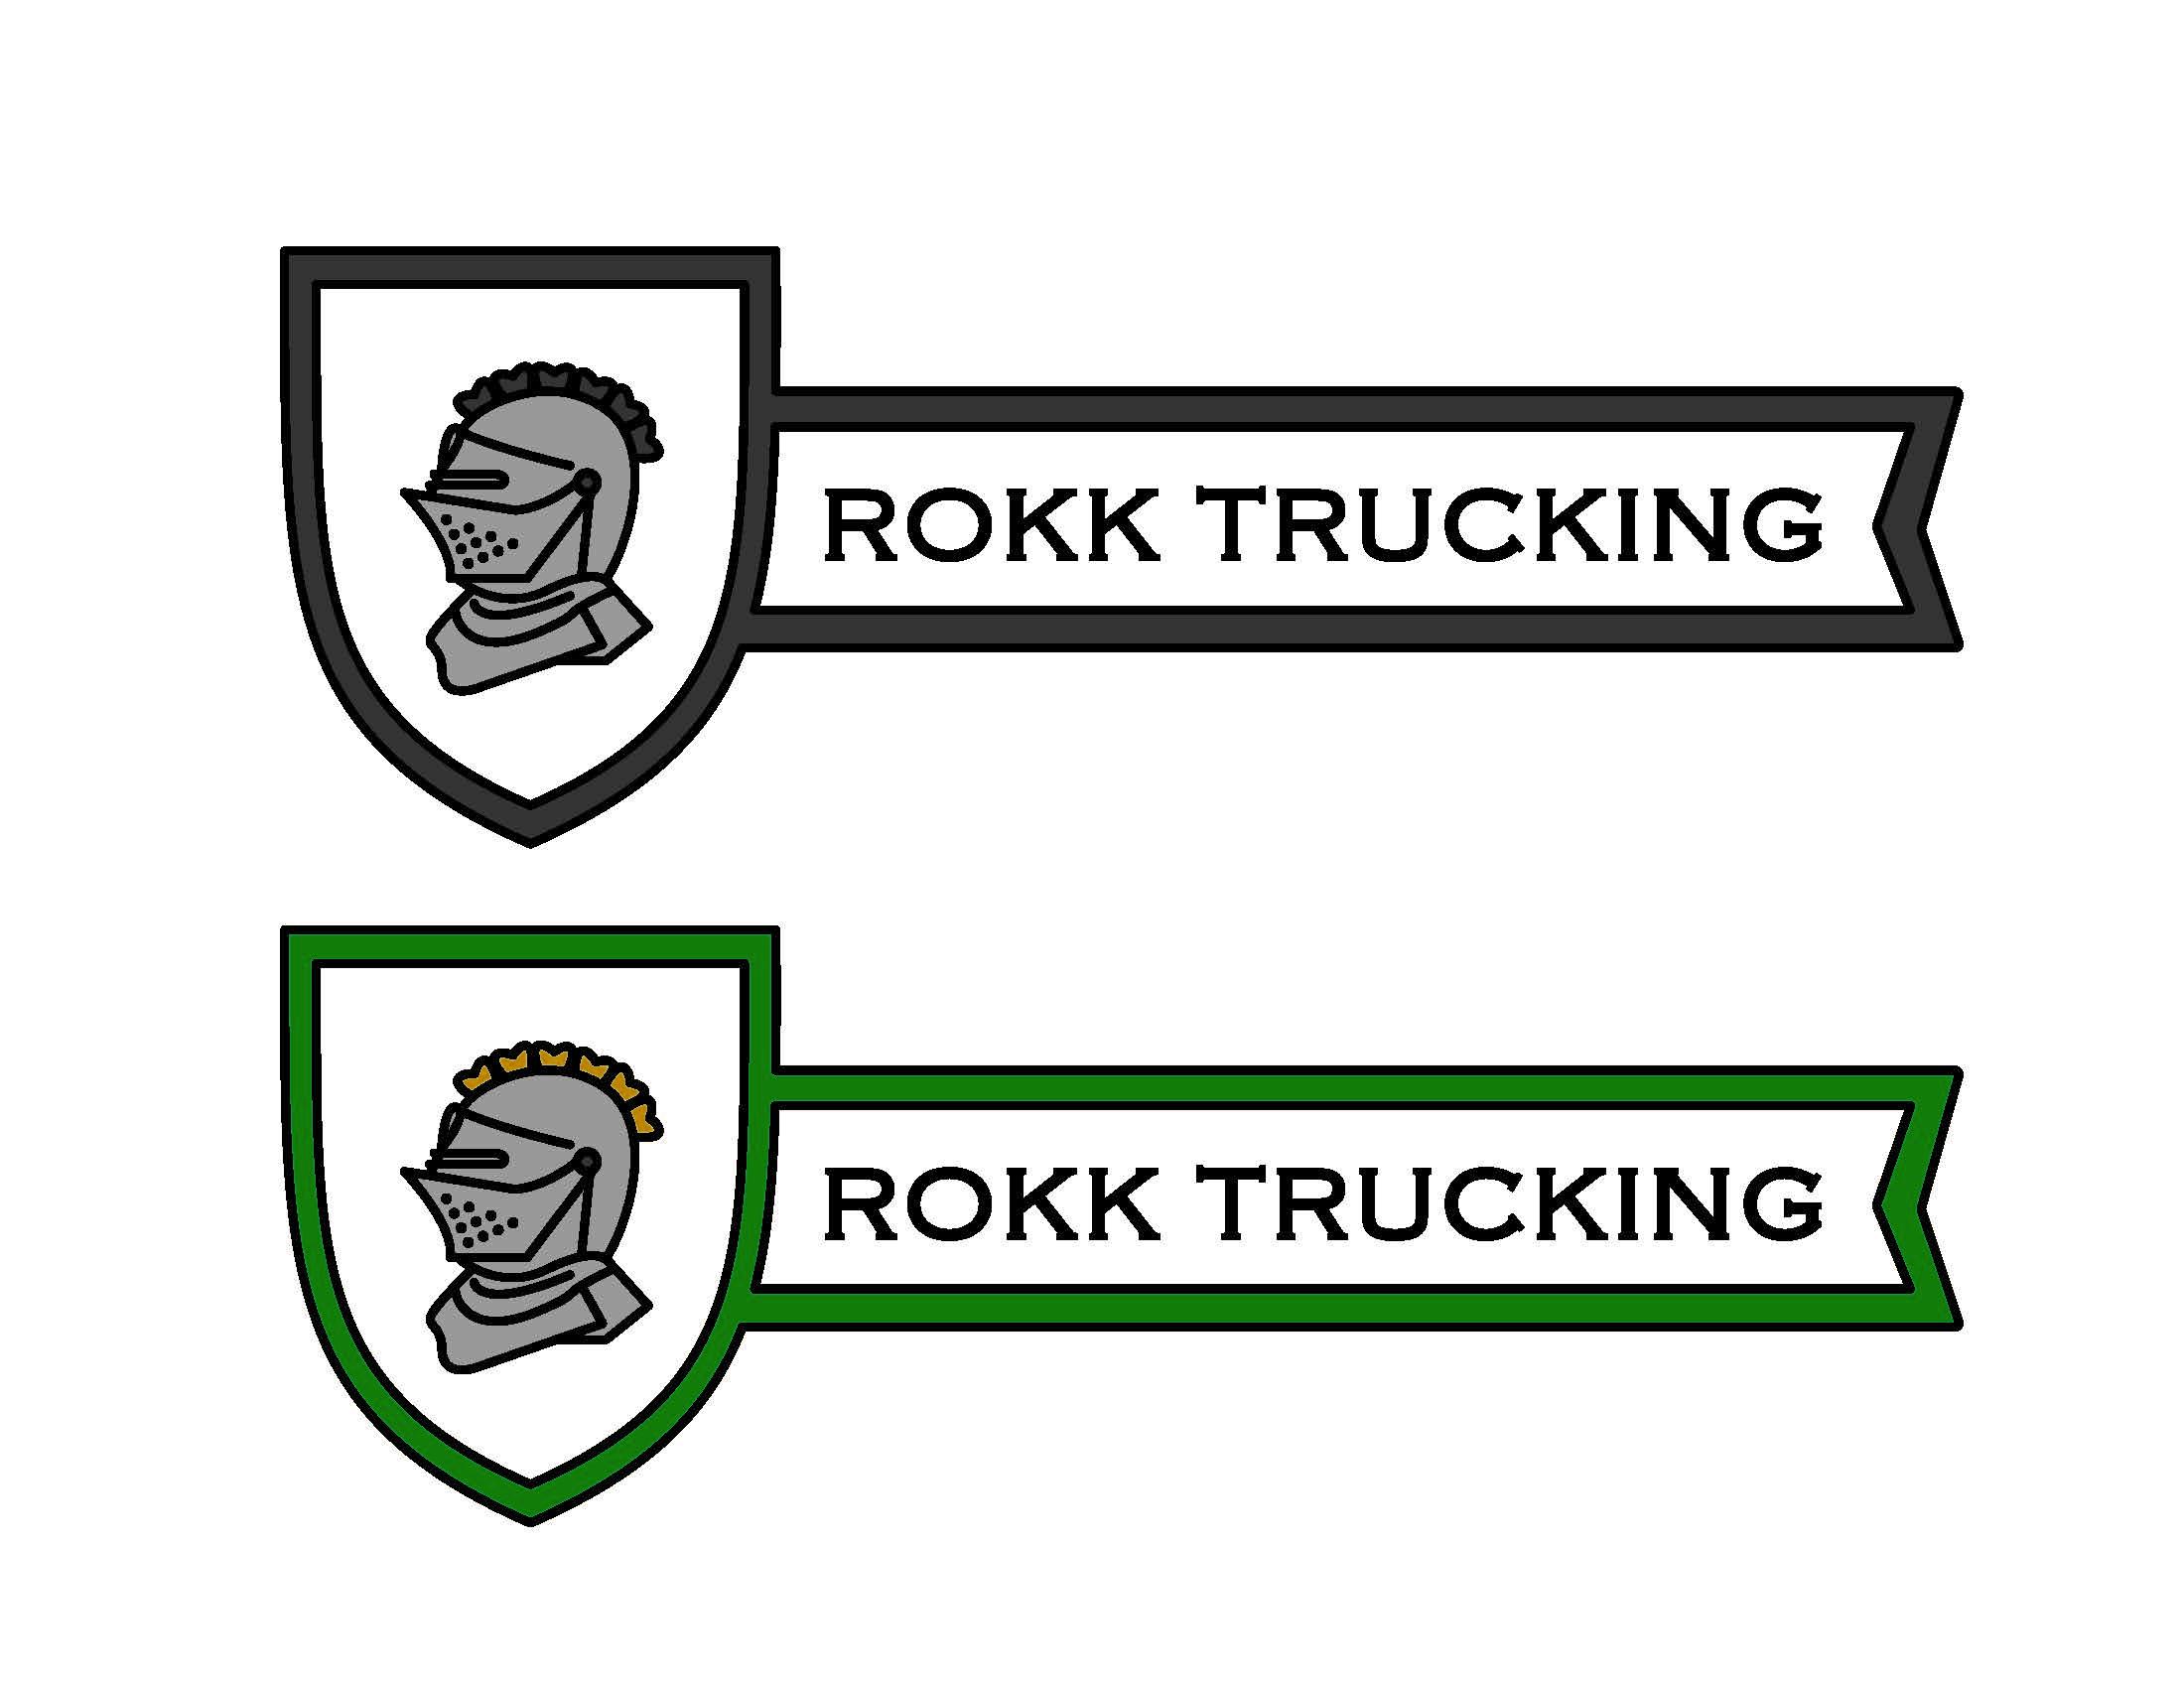 rokk_trucking_logo.10.21.16_Page_3.jpg